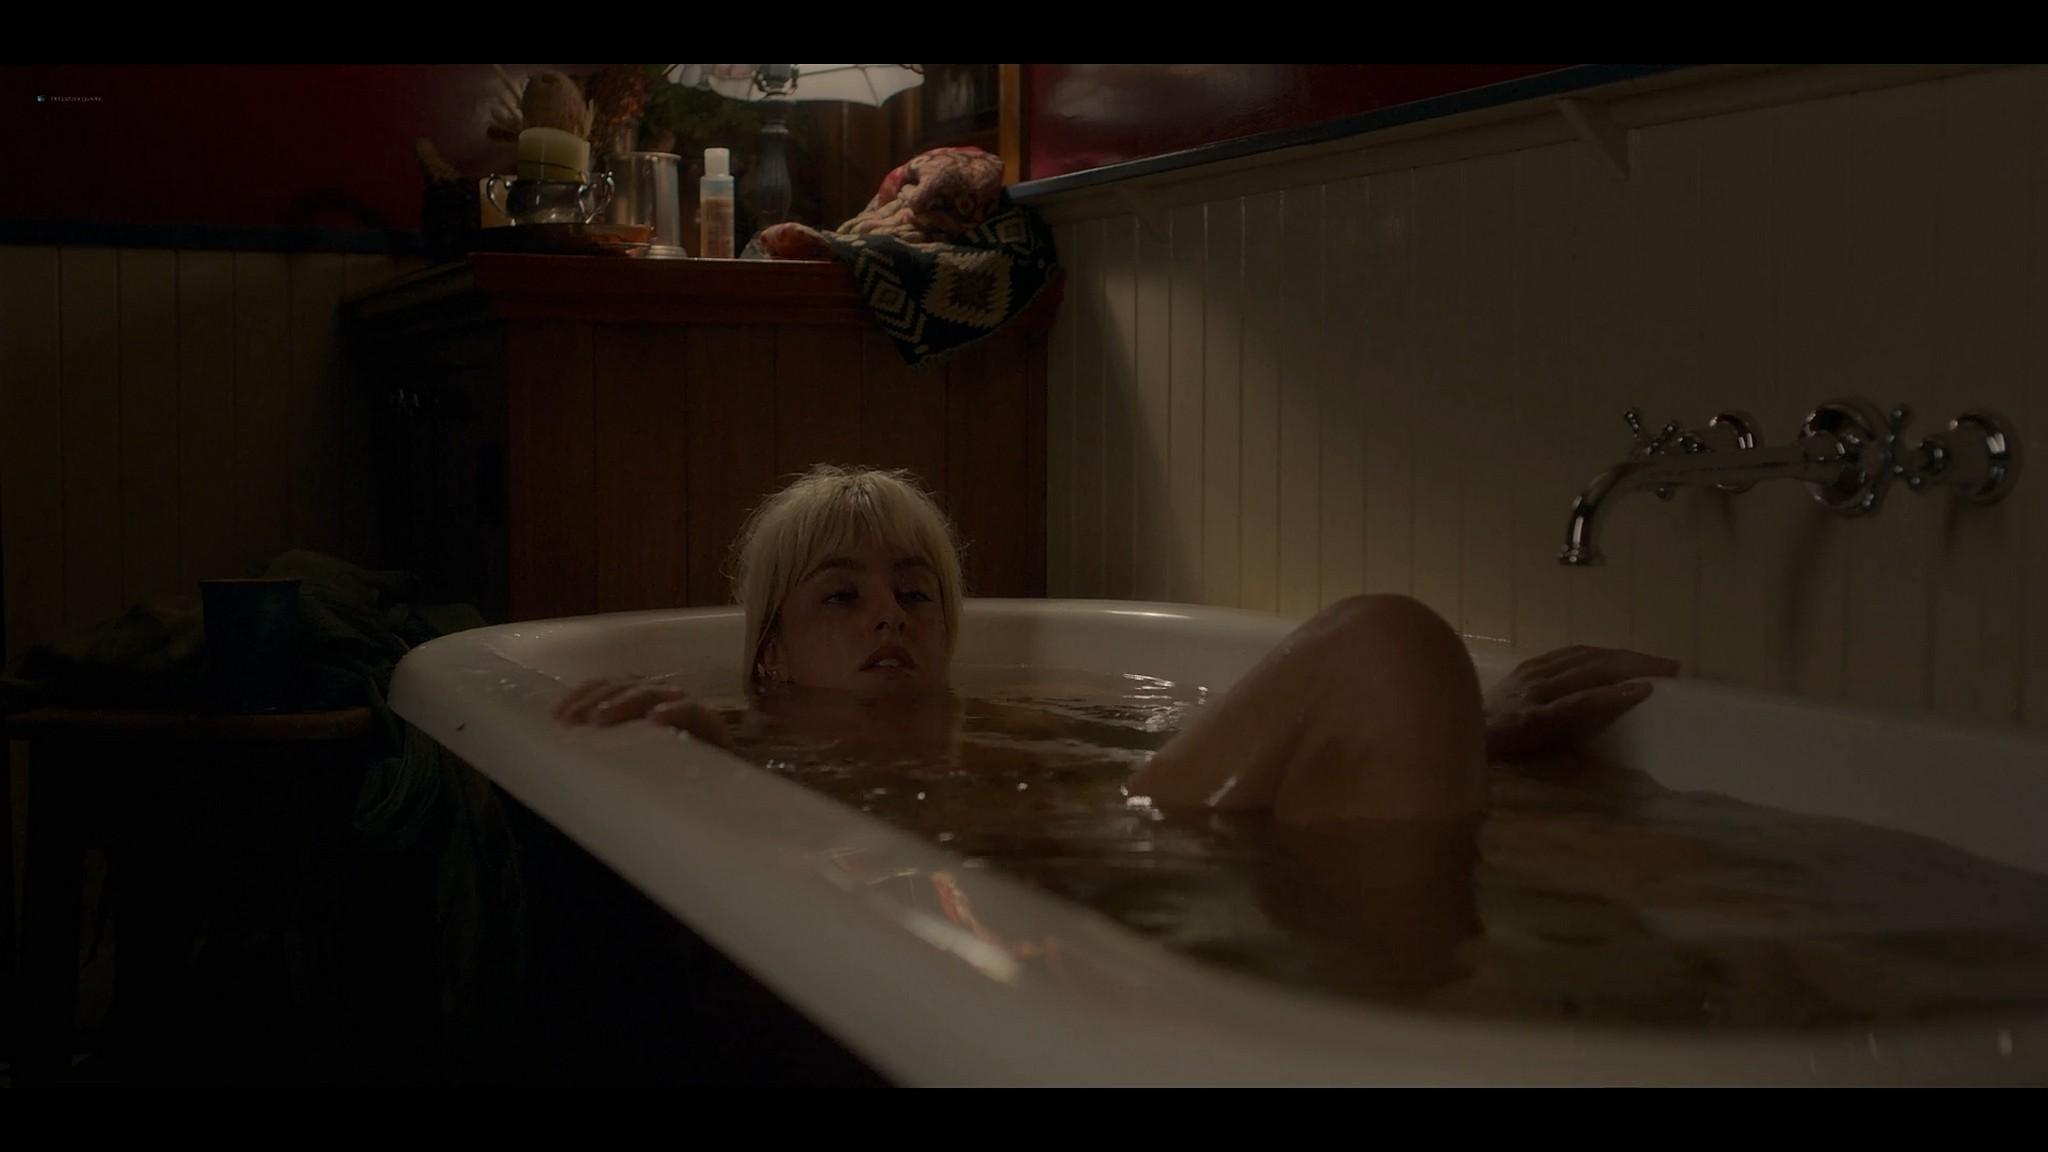 BeBe Bettencourt sexy Sophie Wilde Priscilla Doueihy hot lesbian sex Eden AU 2021 s1e4 8 1080p Web 14